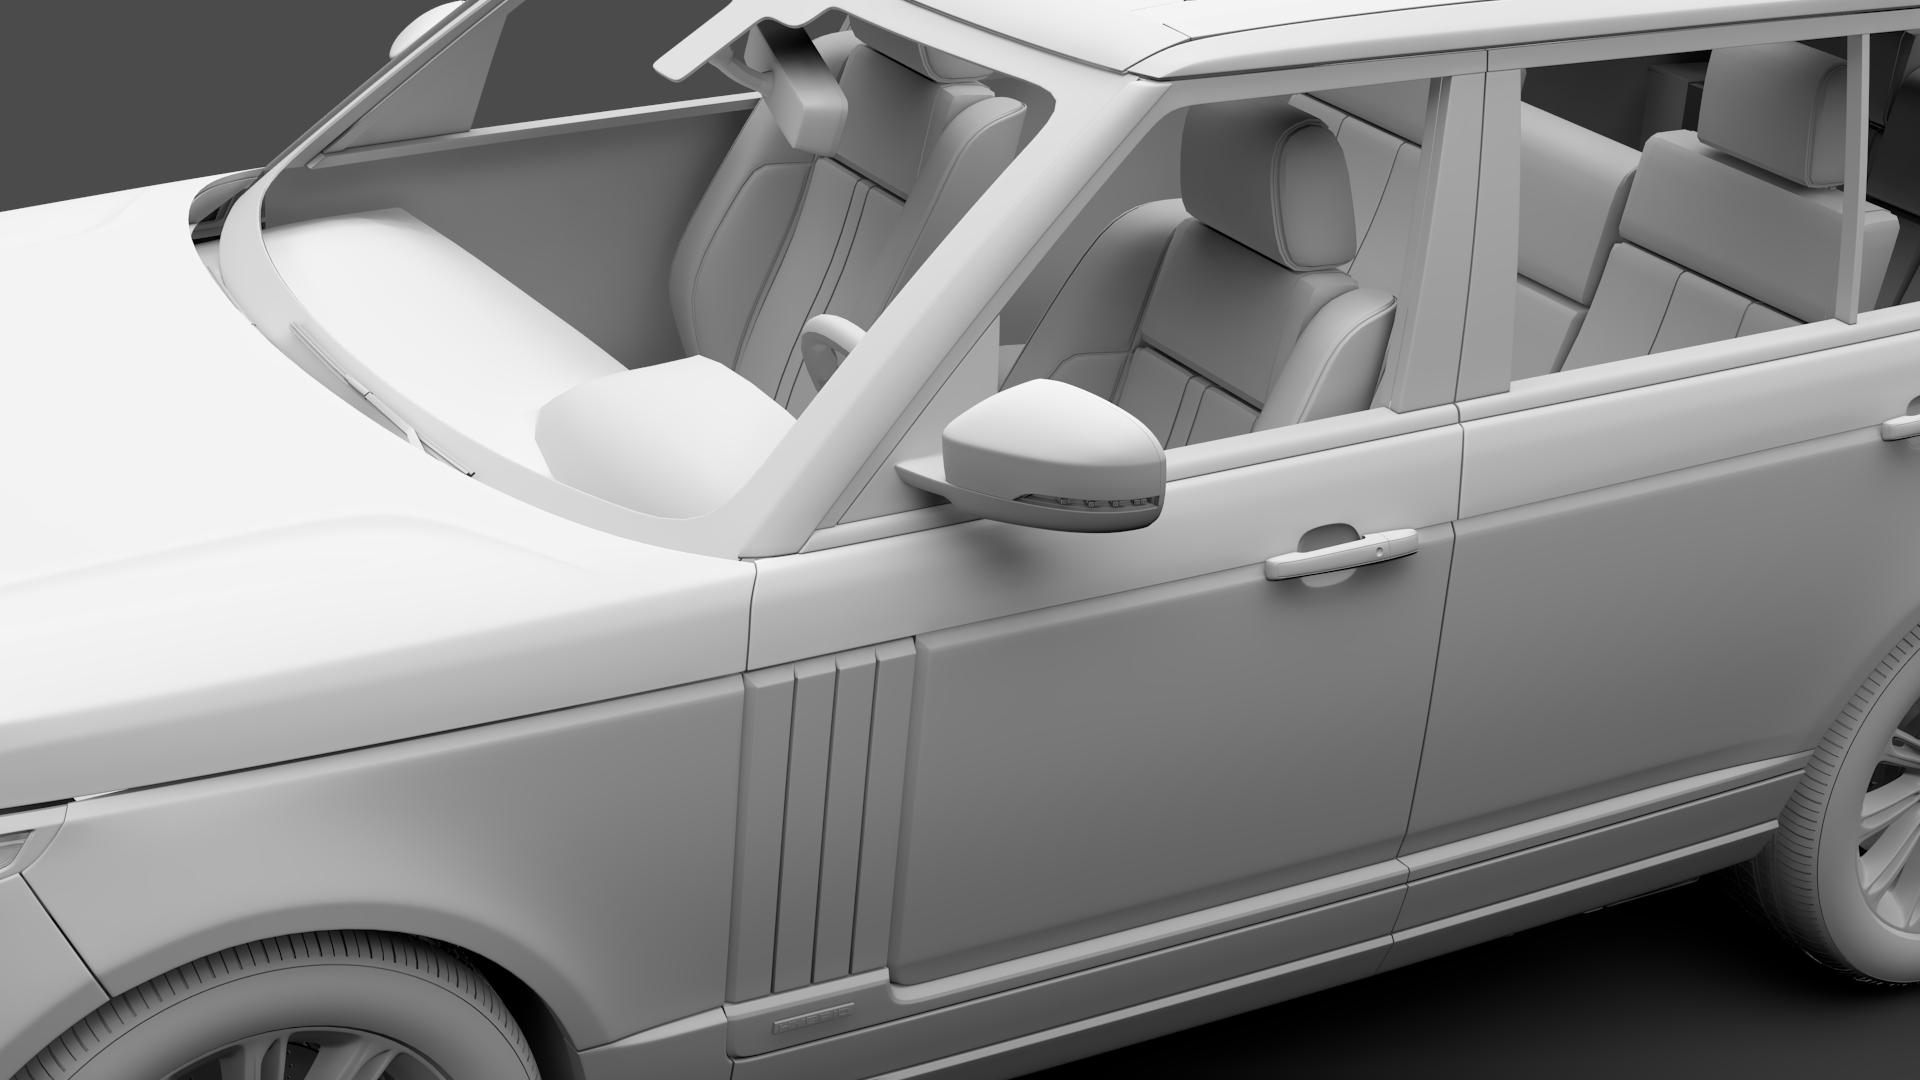 range rover autobiography hybrid lwb l405 2018 3d model max fbx c4d lwo ma mb hrc xsi obj 277310